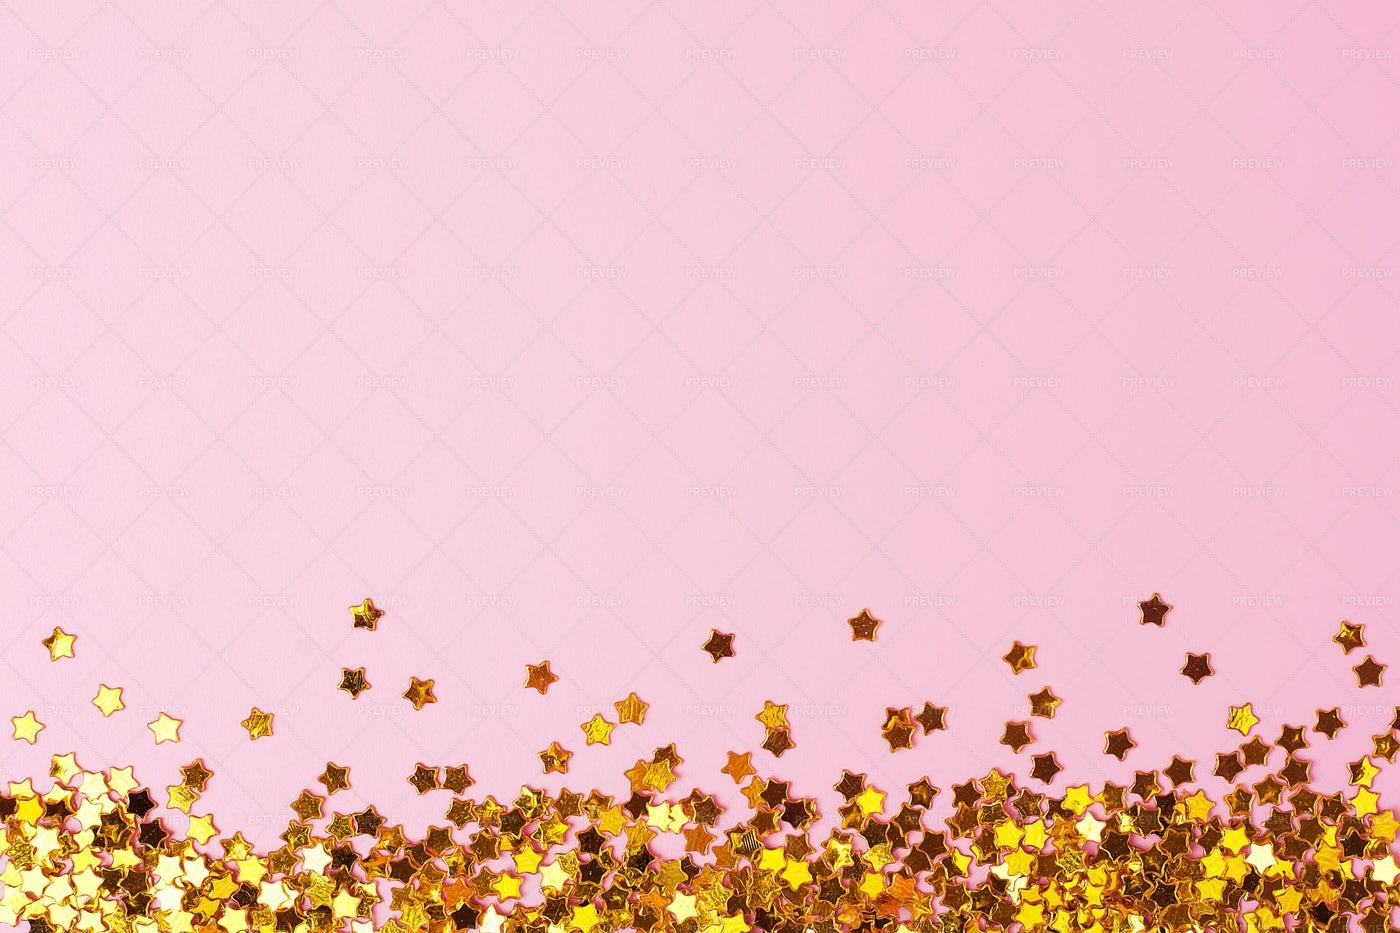 Golden Confetti On Pink: Stock Photos